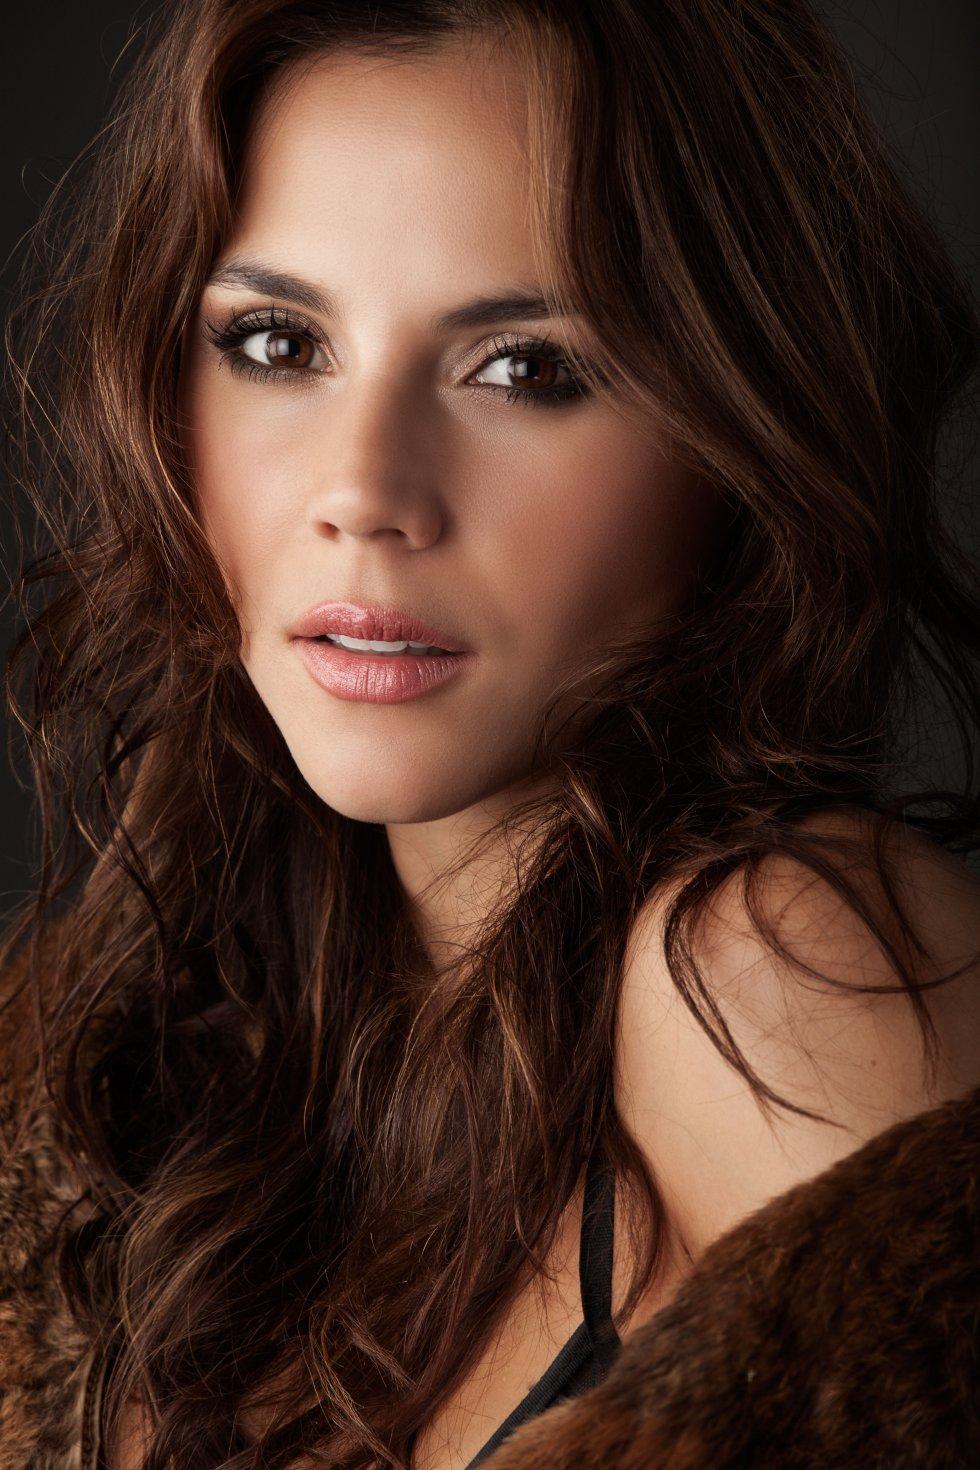 Jennifer Arenas, actriz de la novela 'Sin senos sía hay paraiso'